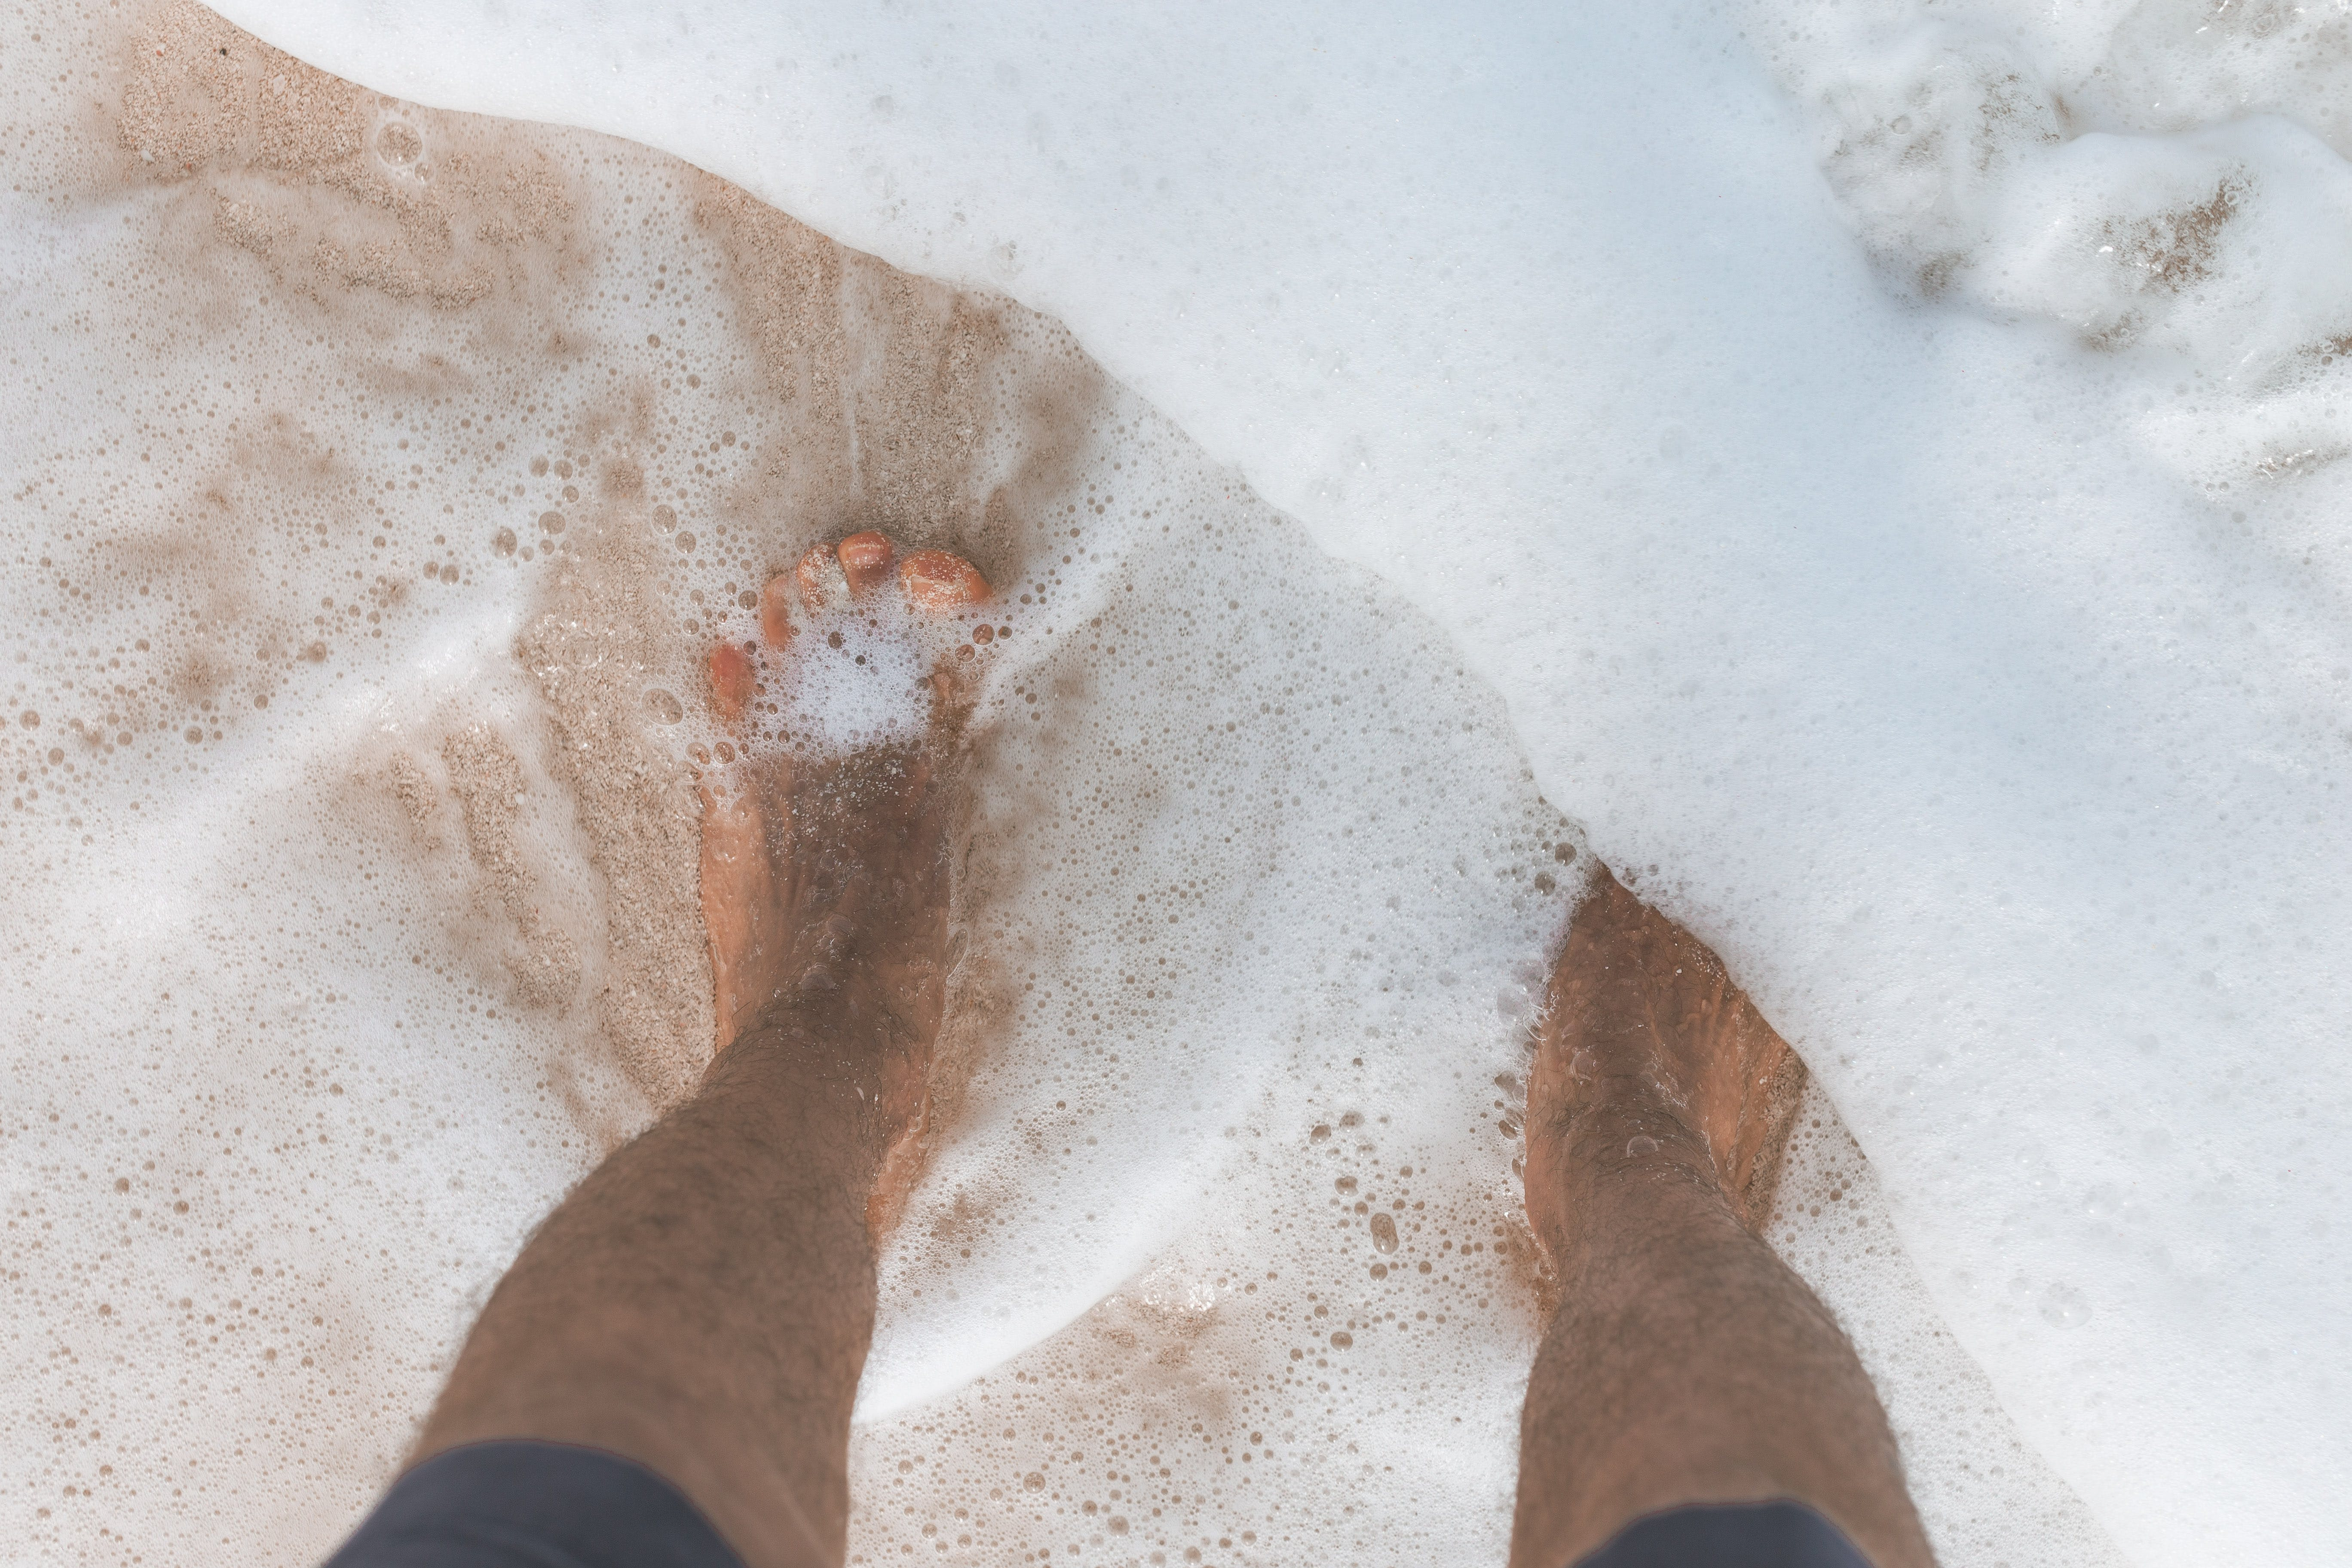 Ocean Water Washing over Man's feet